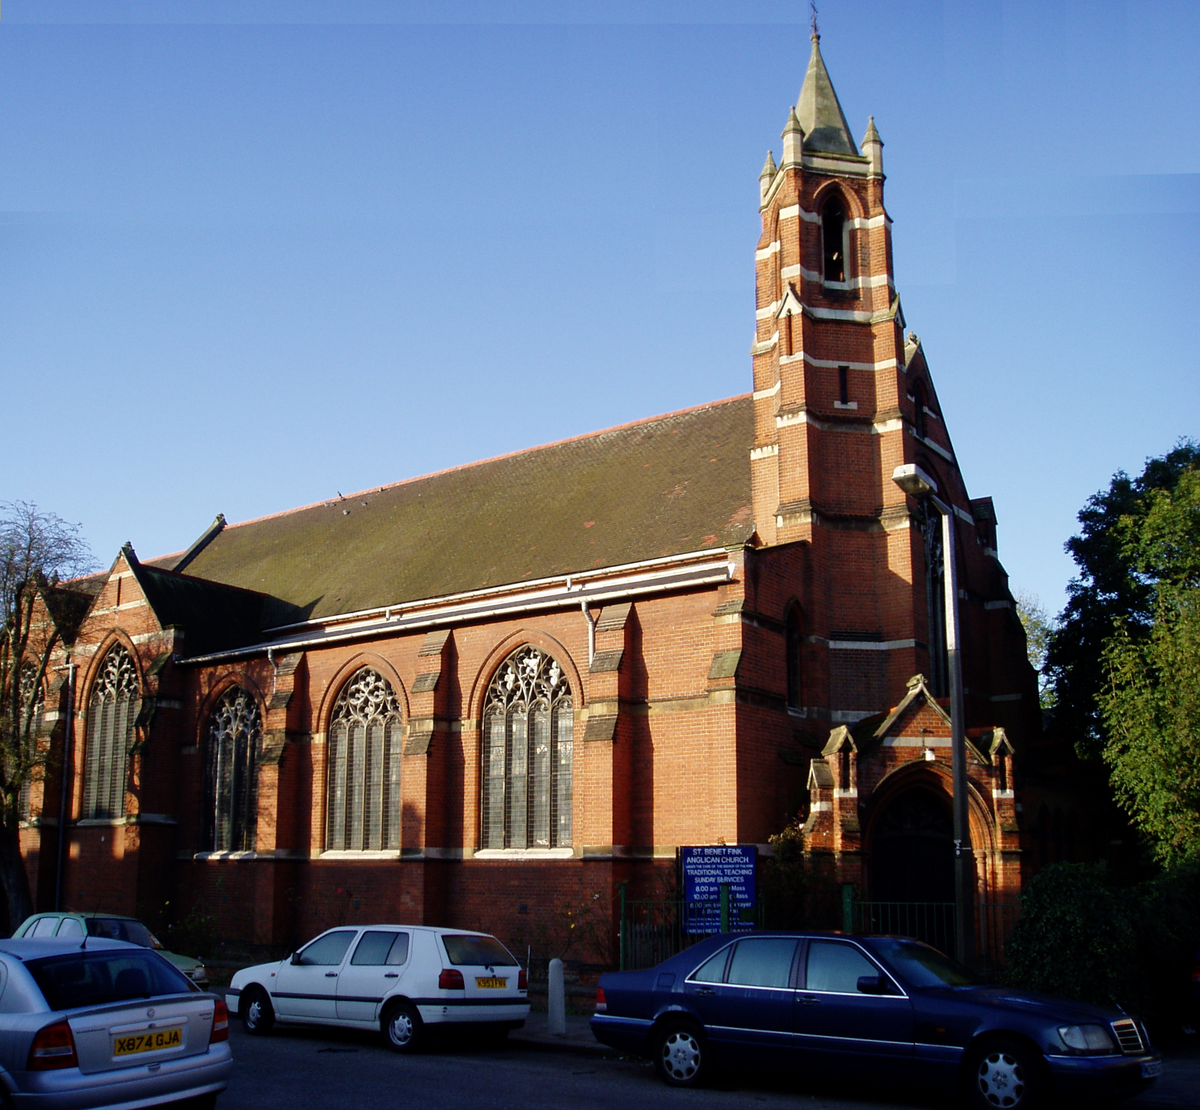 St Benet Fink Church, Tottenham - Wikipedia